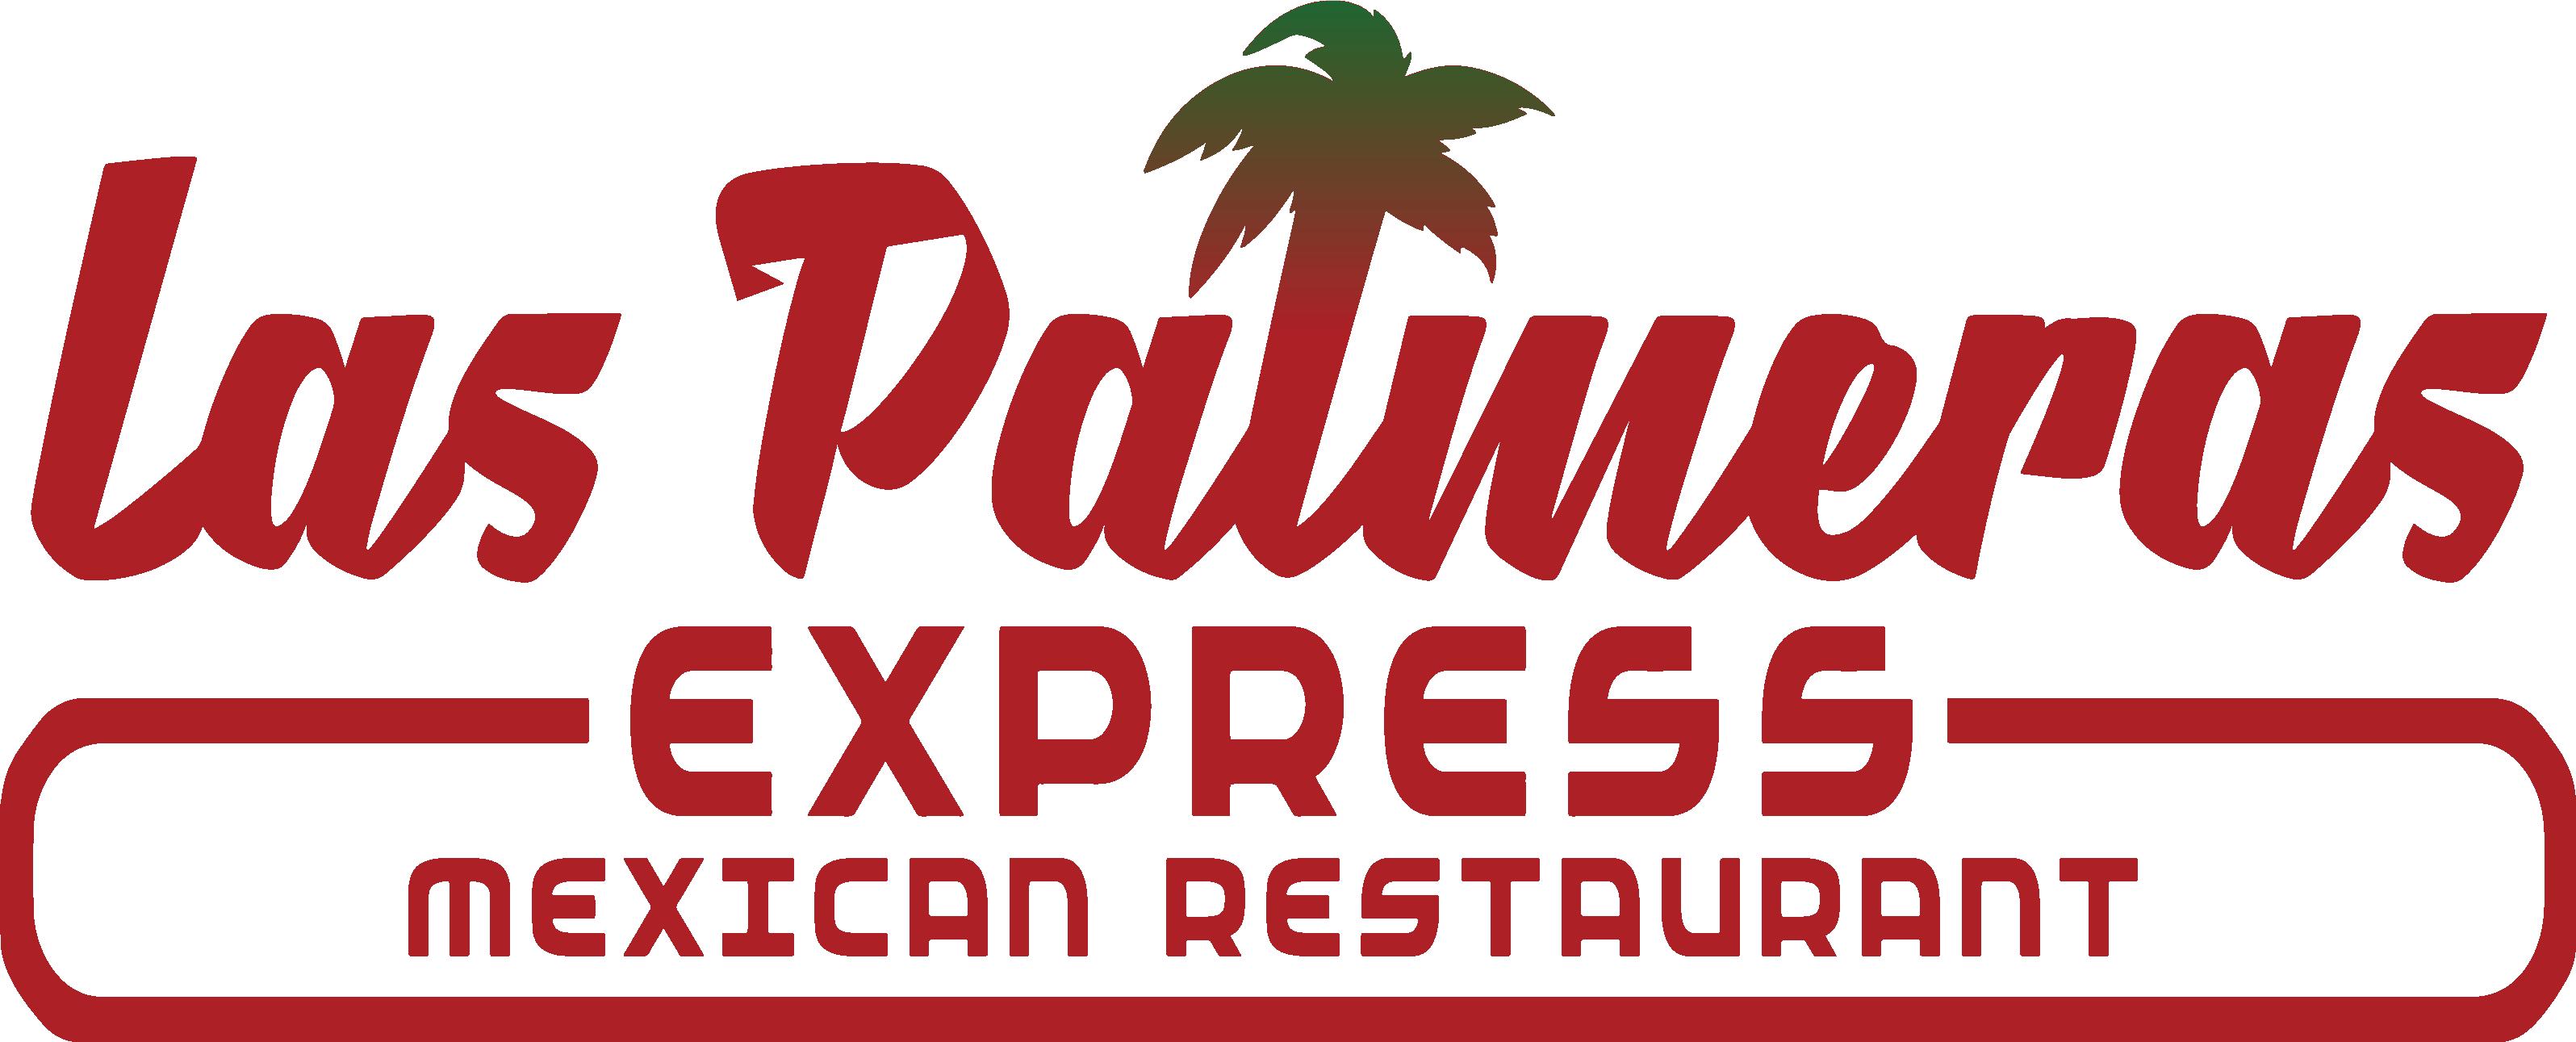 Las Palmeras Express Red-Green logo (1)